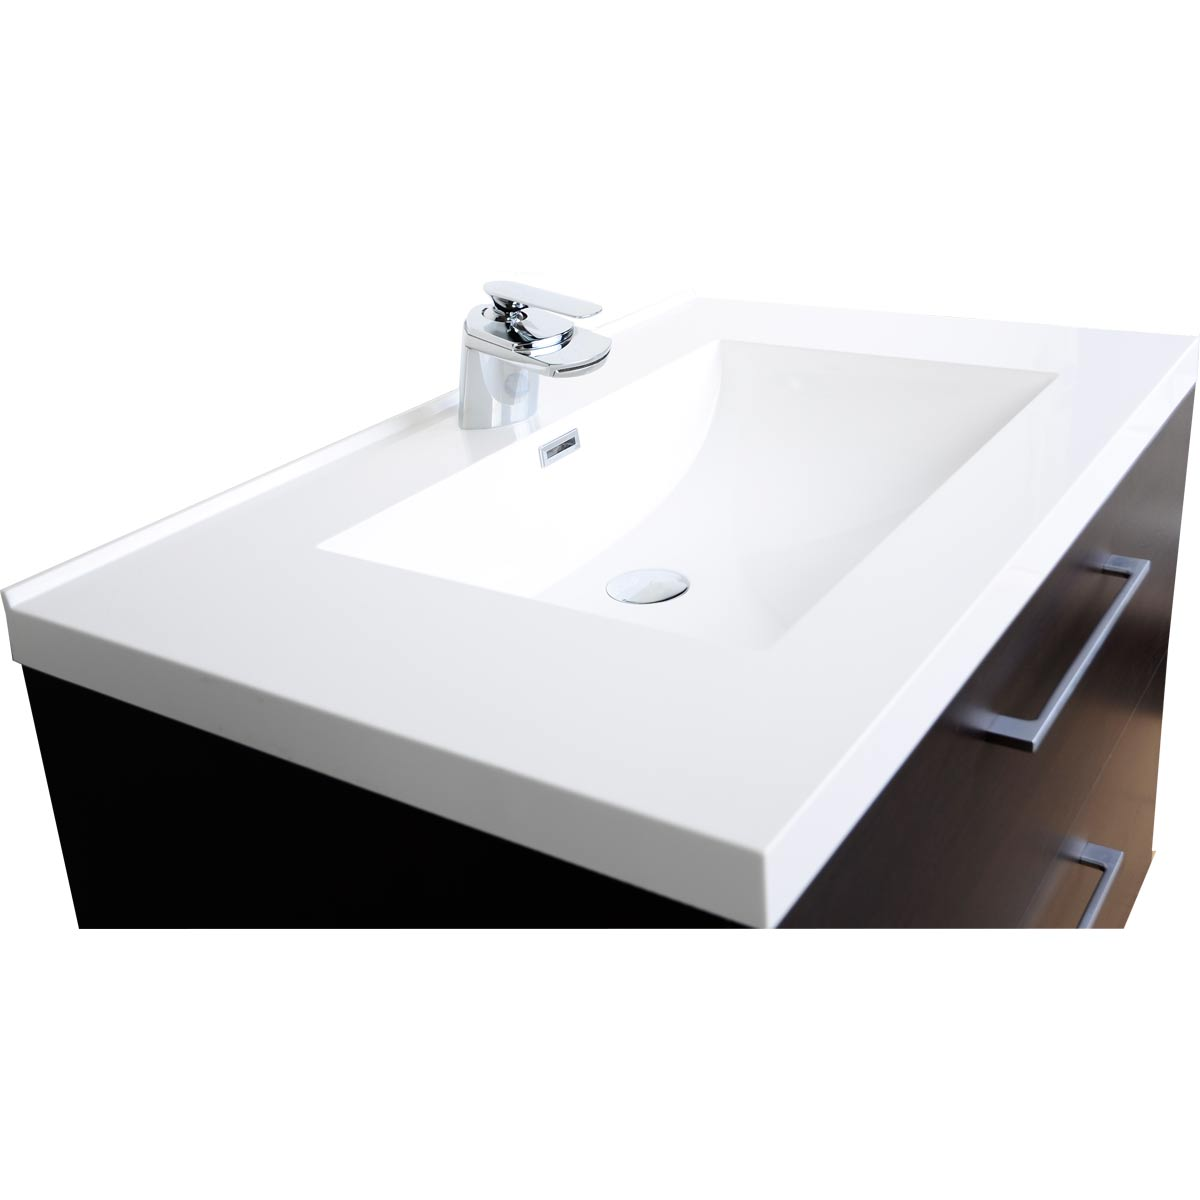 33 5 Wall Mount Contemporary Bathroom Vanity Set Espresso Tn Ta860 Wg